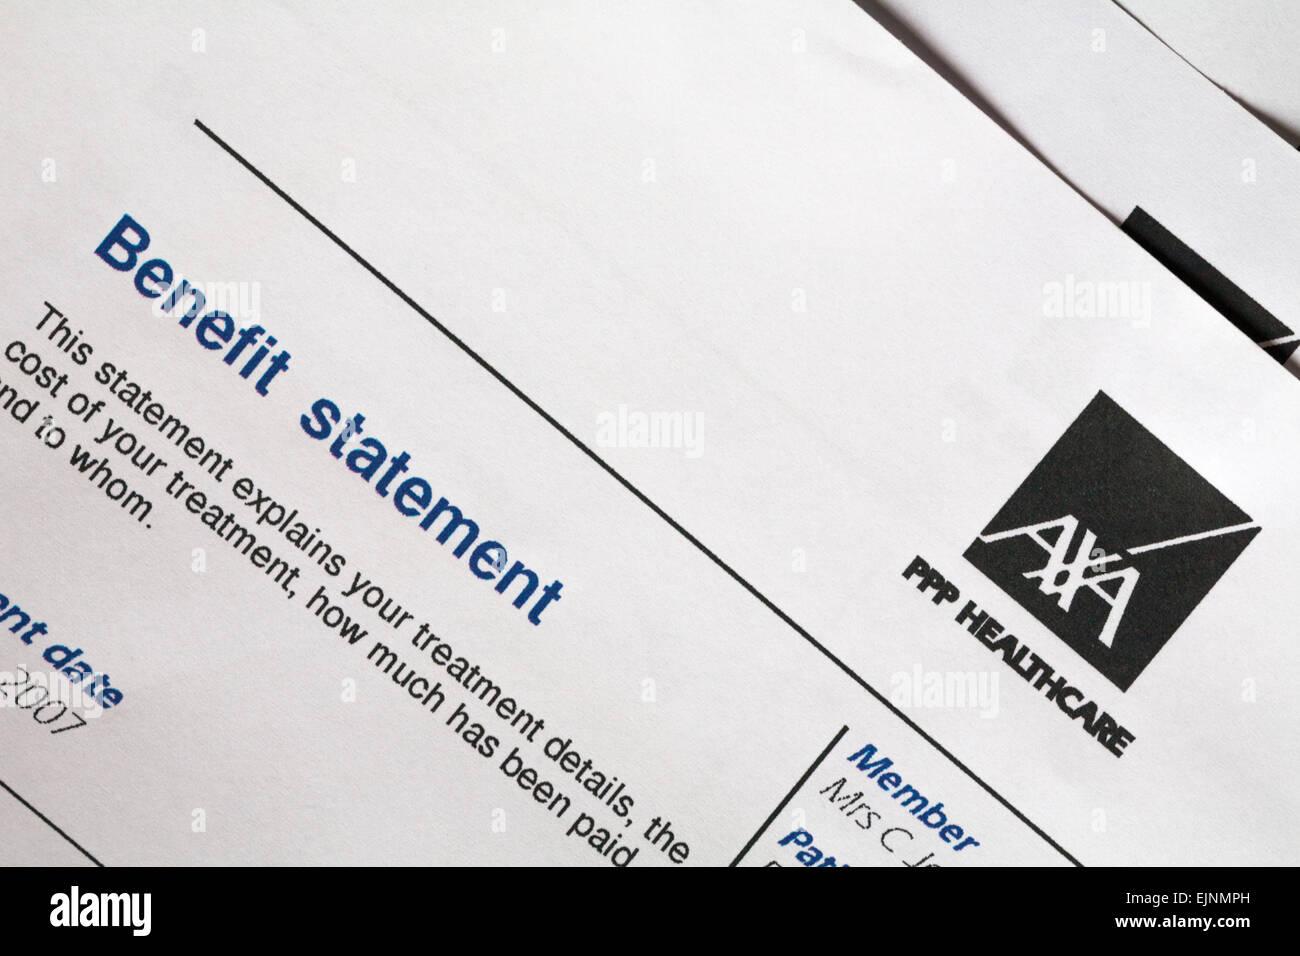 axa ppp healthcare benefit statement stock photo 80382585 alamy